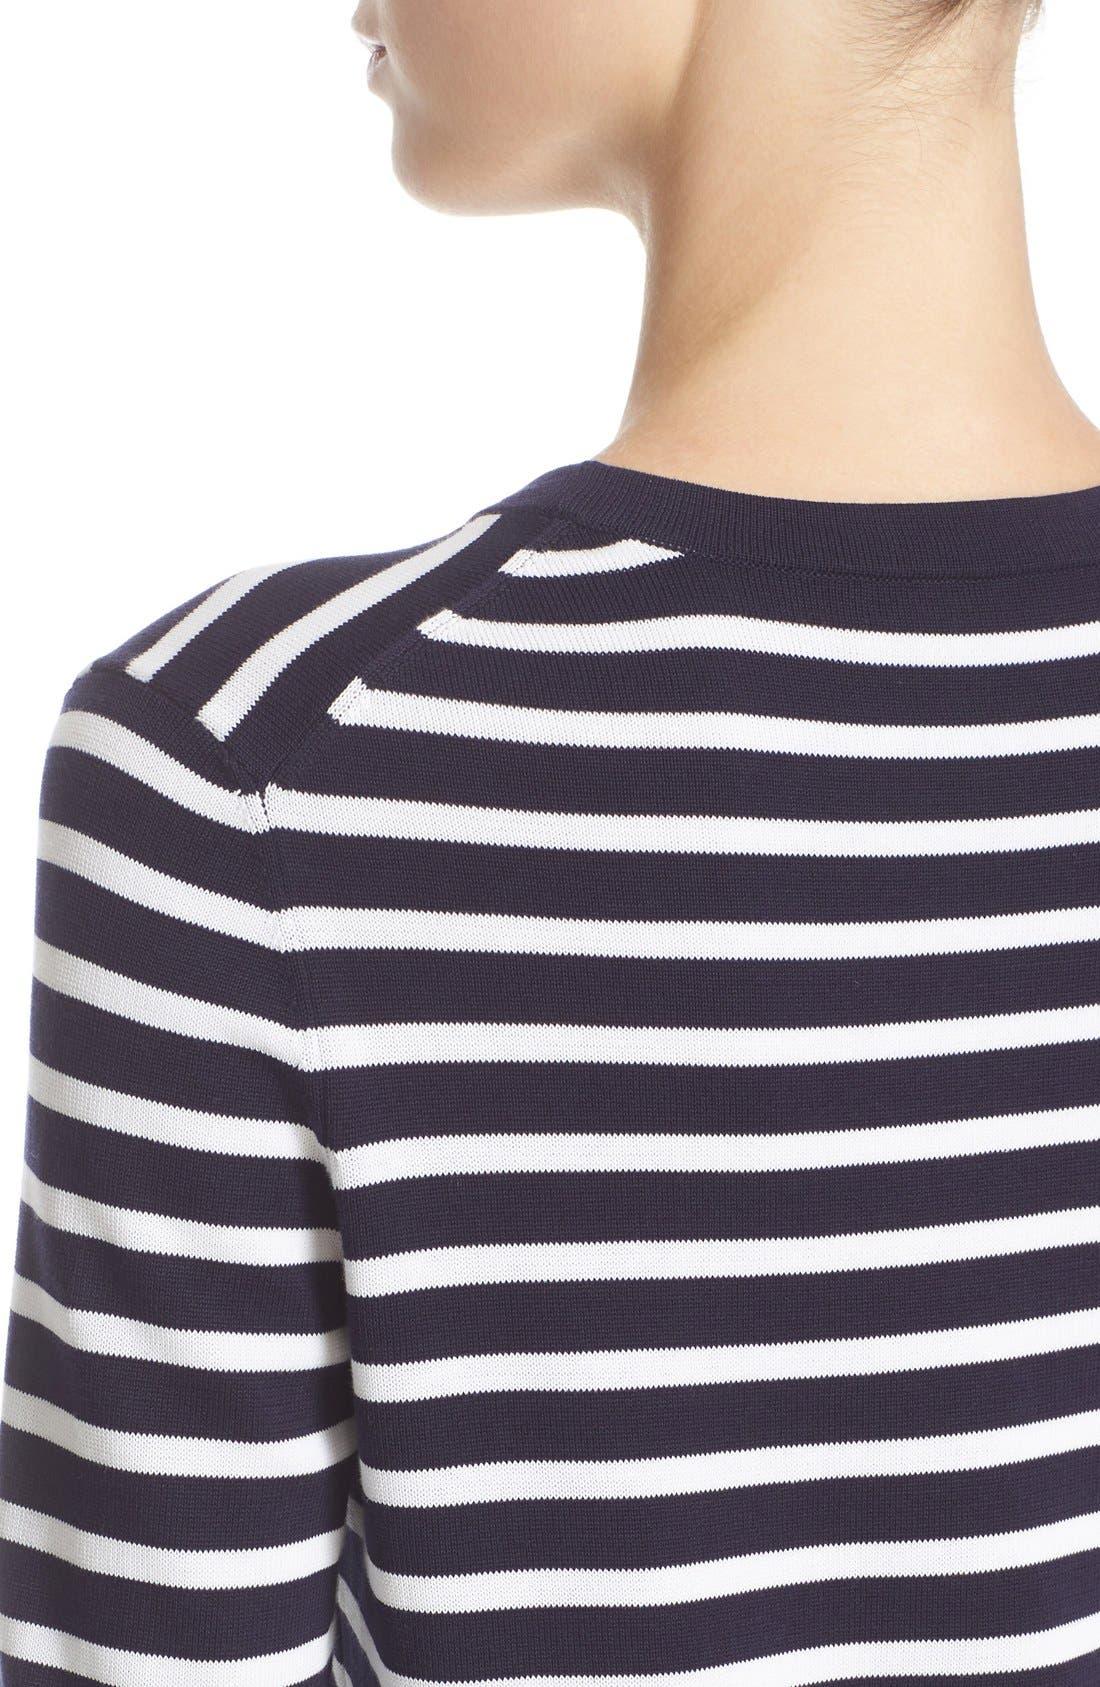 Alternate Image 6  - Michael Kors Stripe T-Shirt Dress